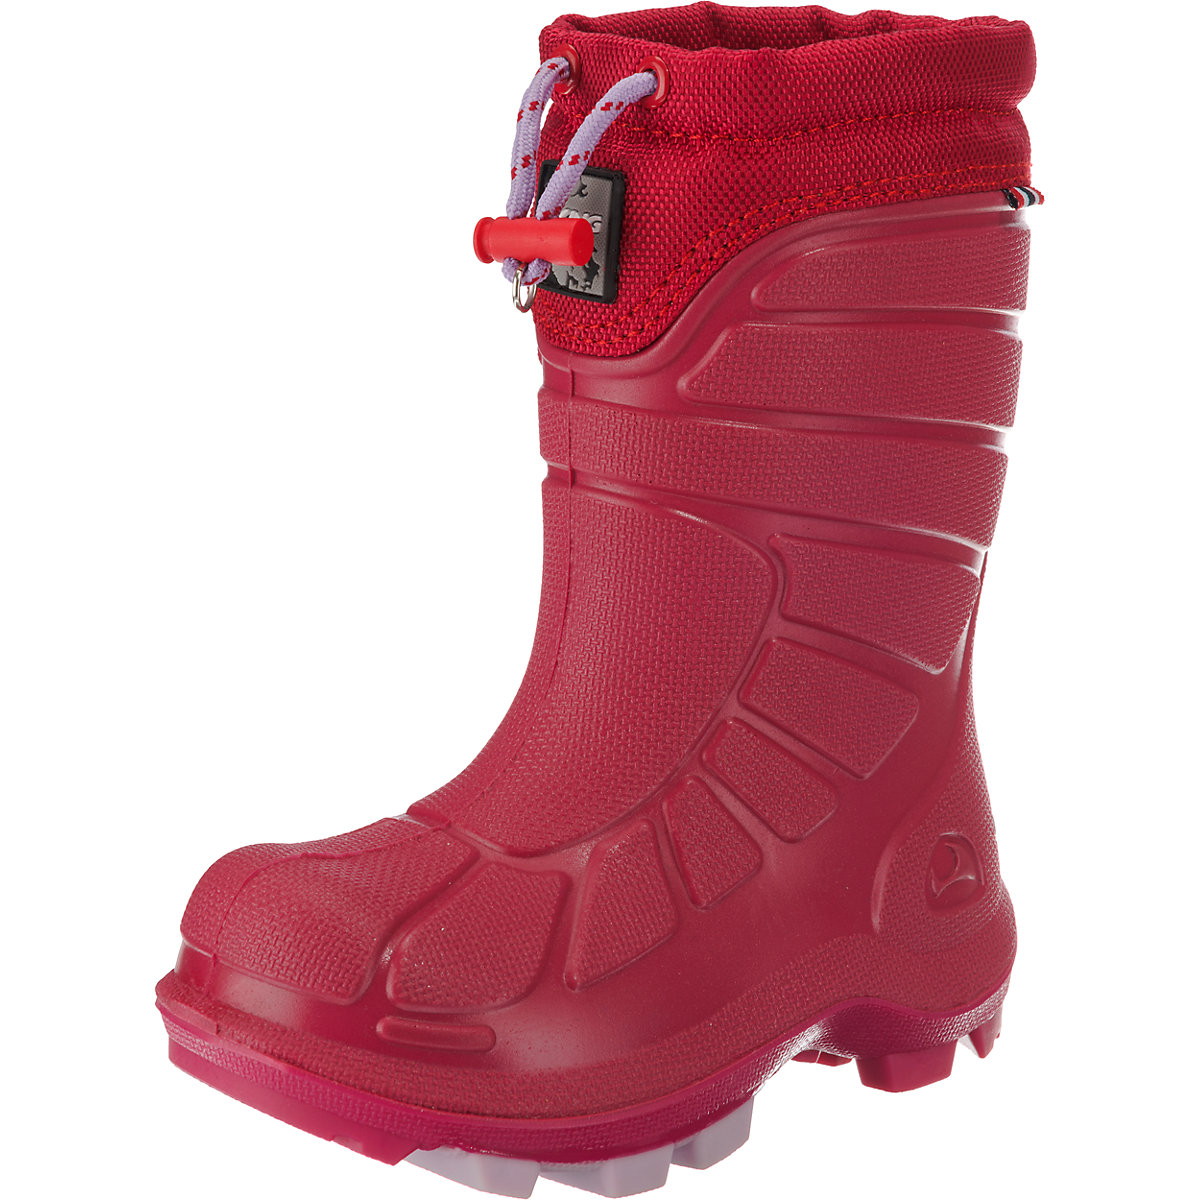 VIKING Boots 8675413 Winter Girls Wool Children Shoes MTpromo